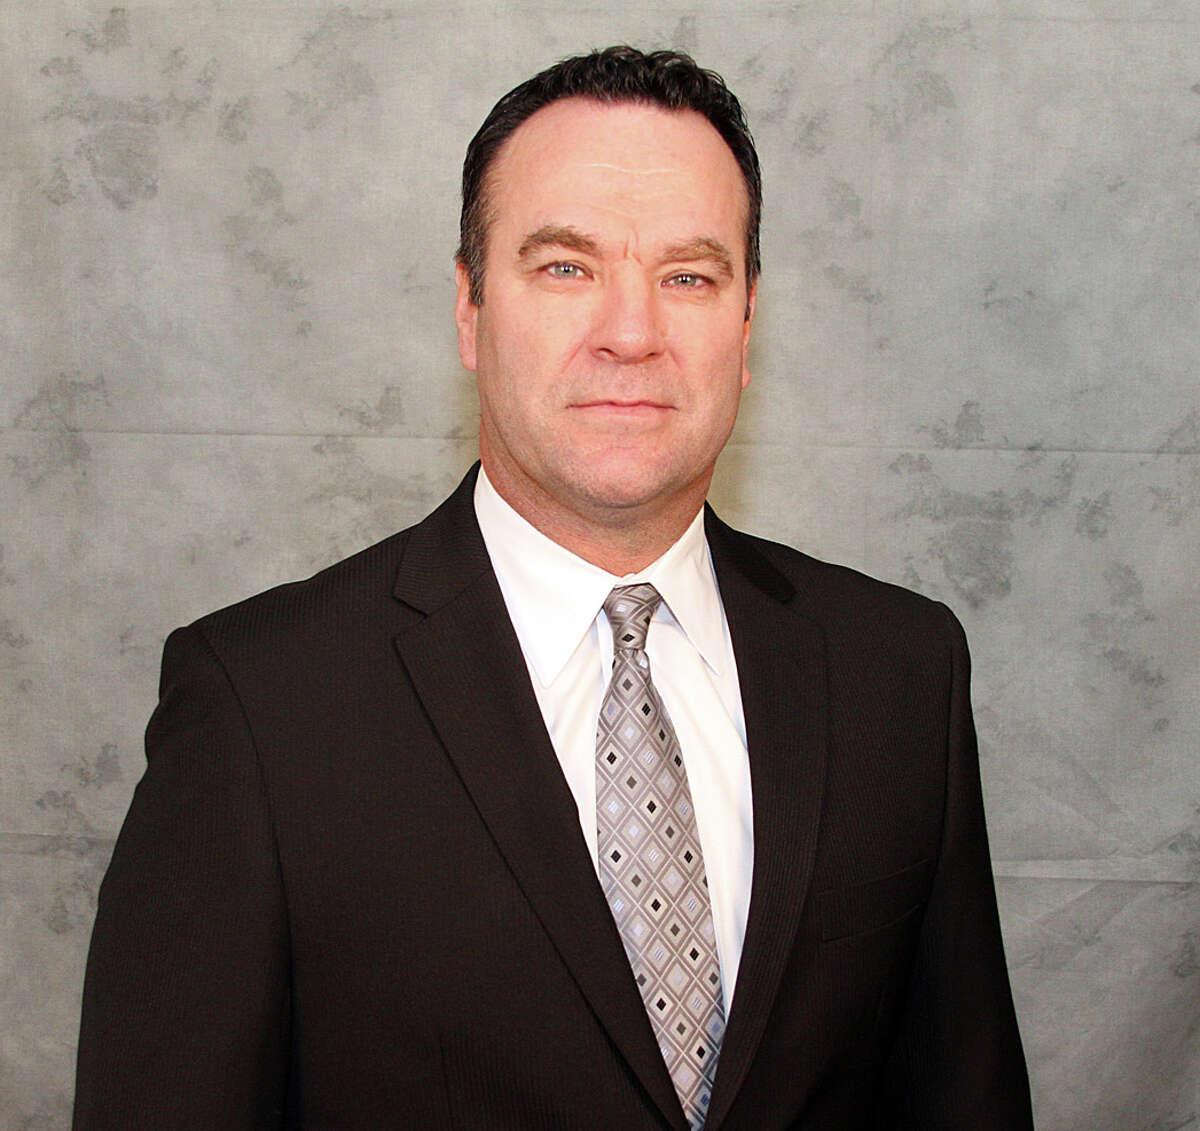 John Torchetti Houston Aeros head coach 2012 team photo